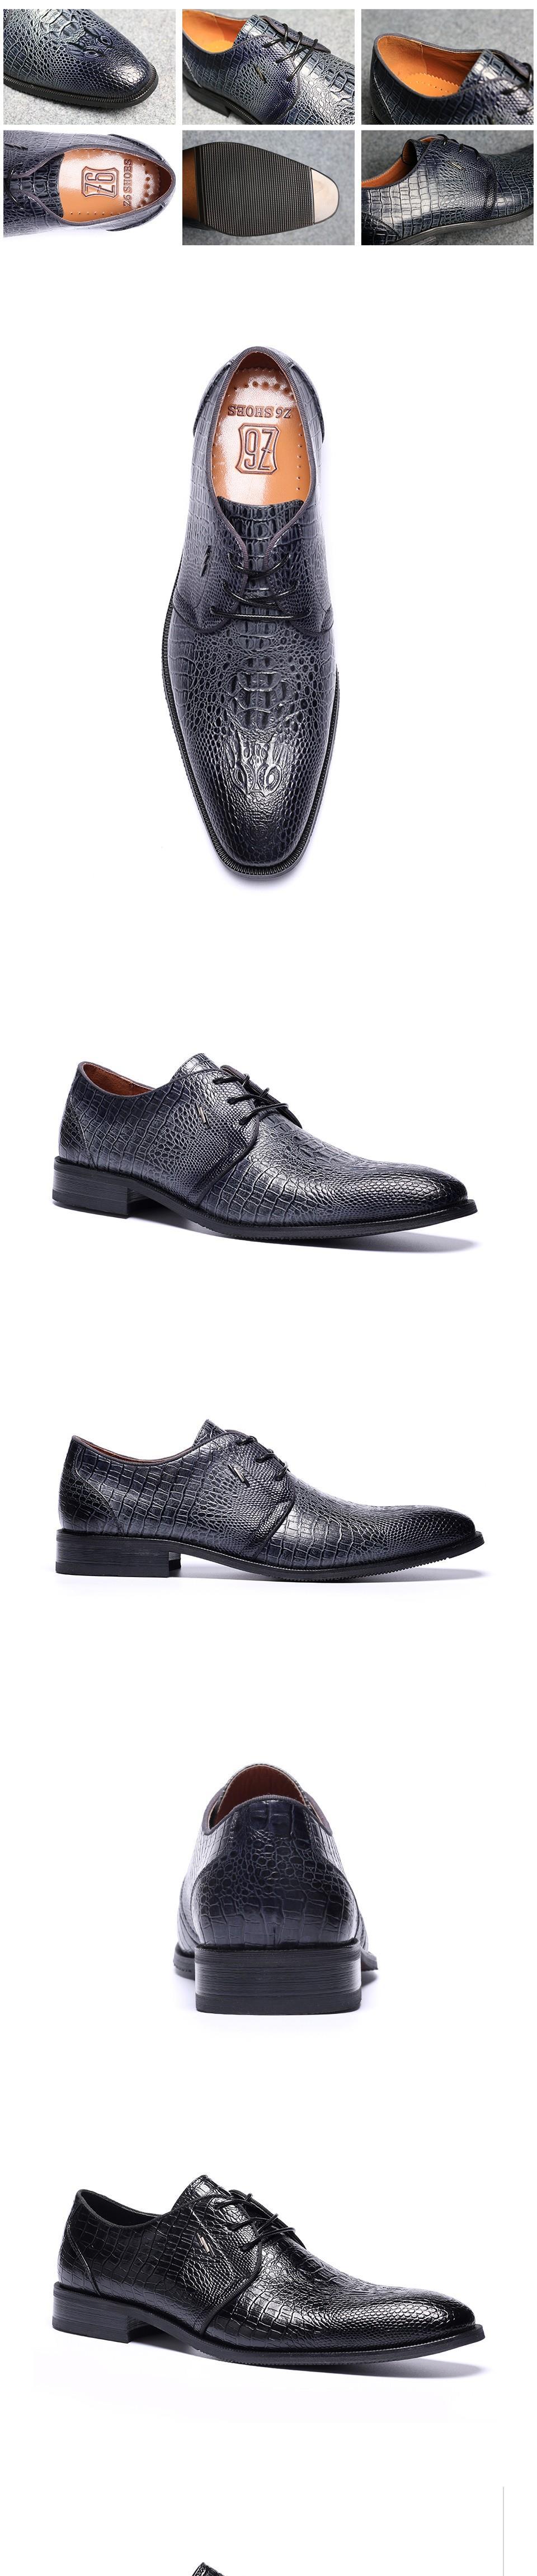 39-48 Men oxfords big size handsome comfortable Z6 brand men wedding shoes #w6267